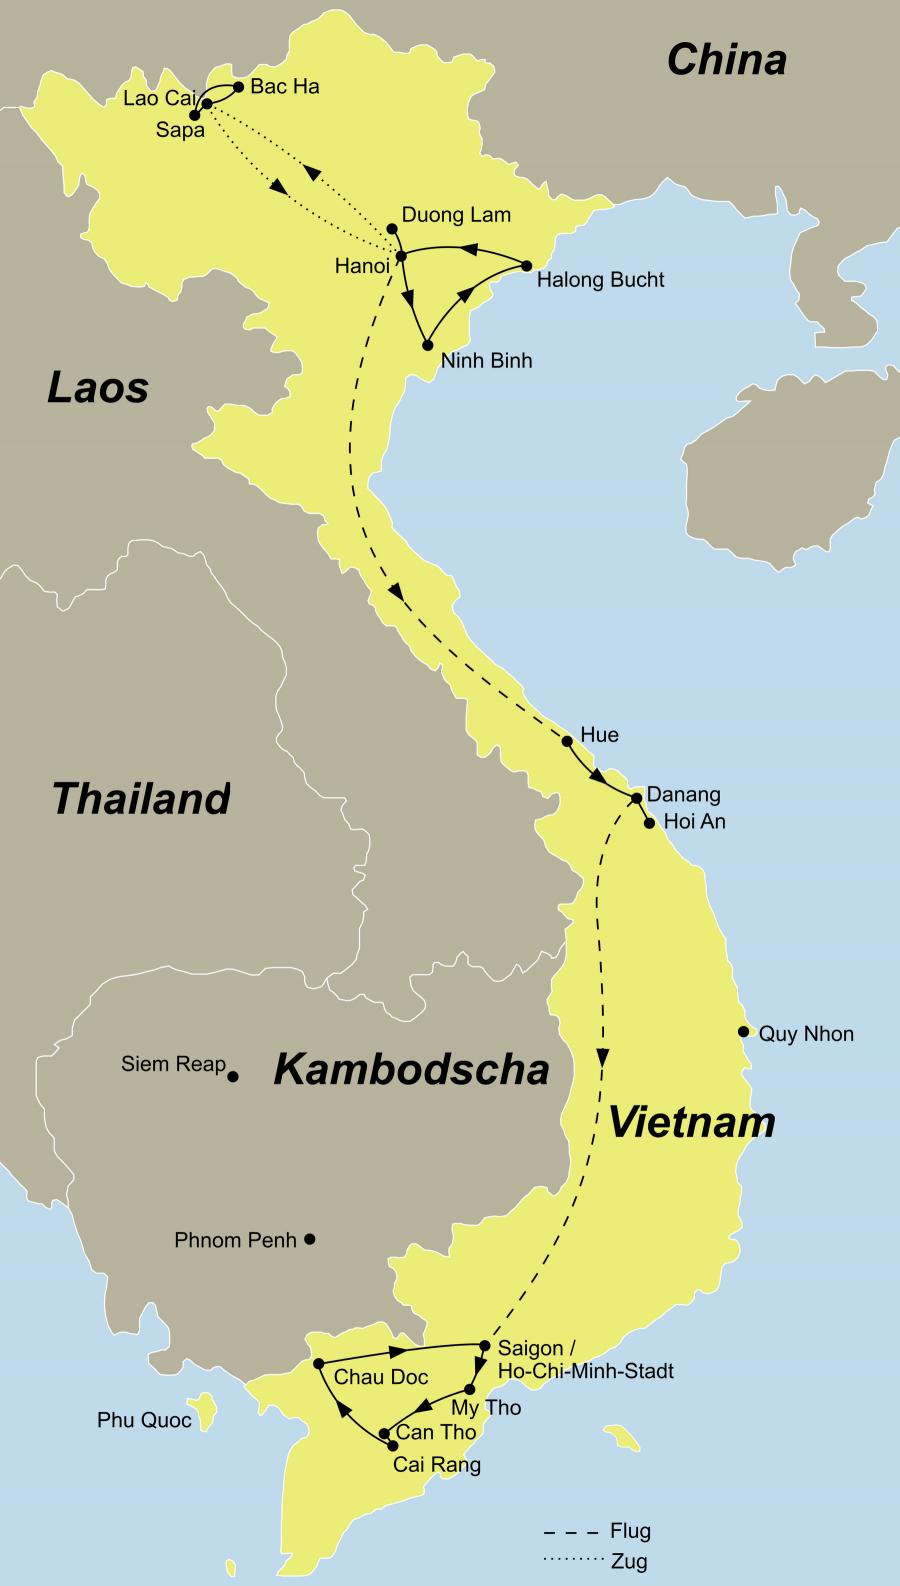 Die Vietnam Rundreise führt von Hanoi über Duong Lam – Hanoi – Lao Cai -- Lao Cai – Sapa -- Bac Ha – Lao Cai – Hanoi -- Ninh Binh – Halong Bucht -- Hanoi – Hue -- Danang – Hoi An -- Danang – Saigon -- Can Tho -- Cai Rang – Chau Doc zurück nach Saigon.